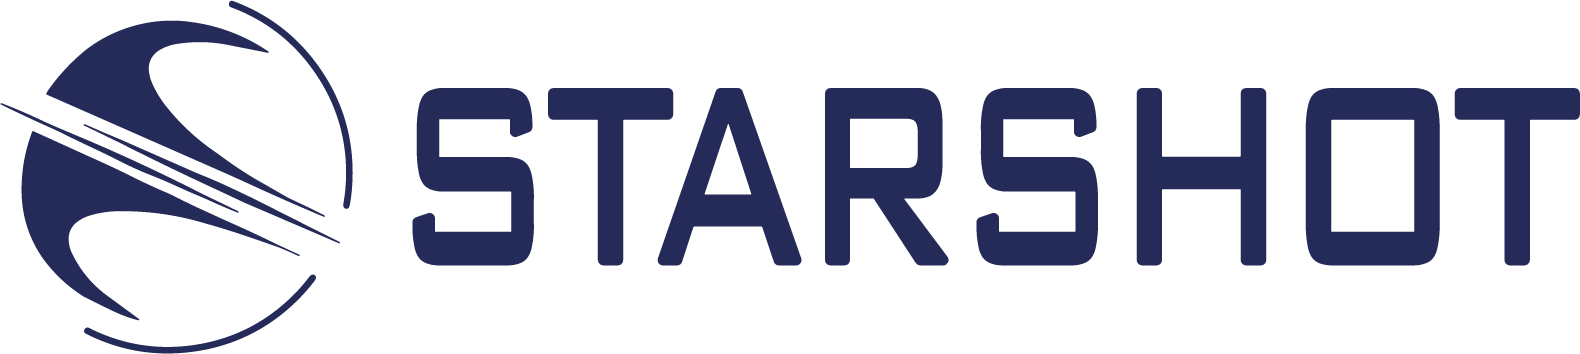 Starshot Tech 星擊科技